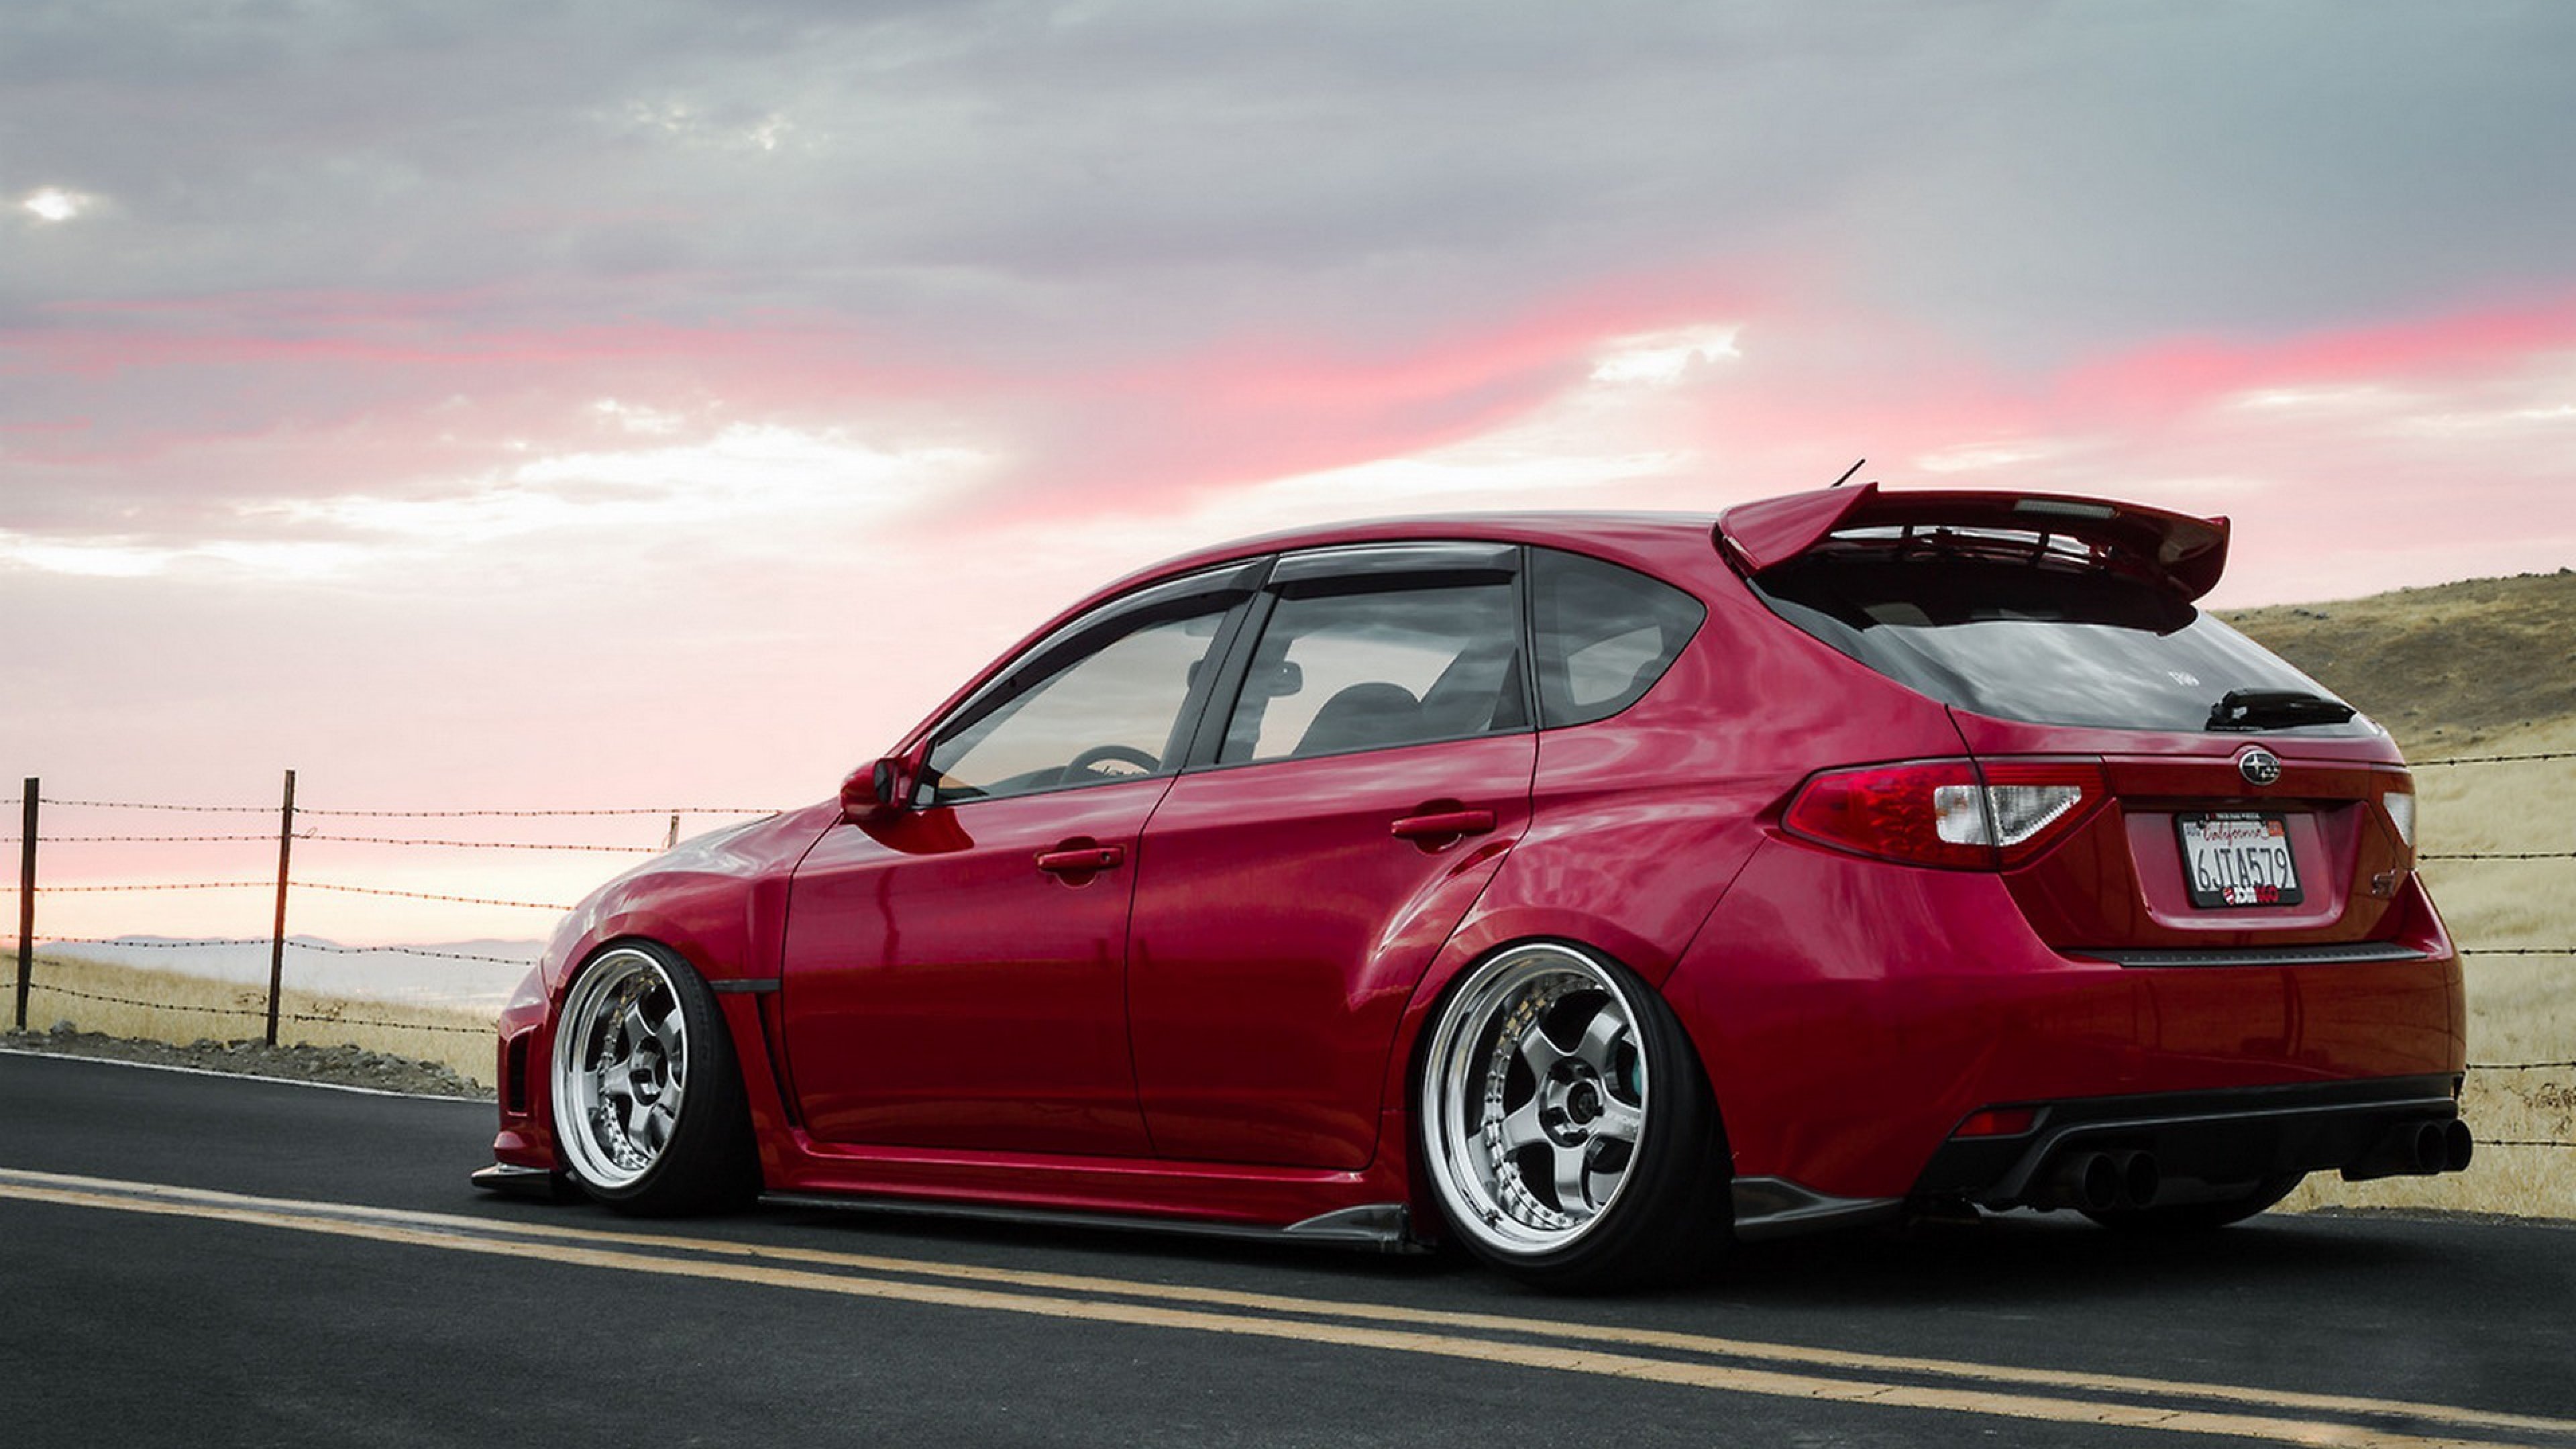 Modified Subaru Sti Wrx >> 4K JDM Wallpaper - WallpaperSafari